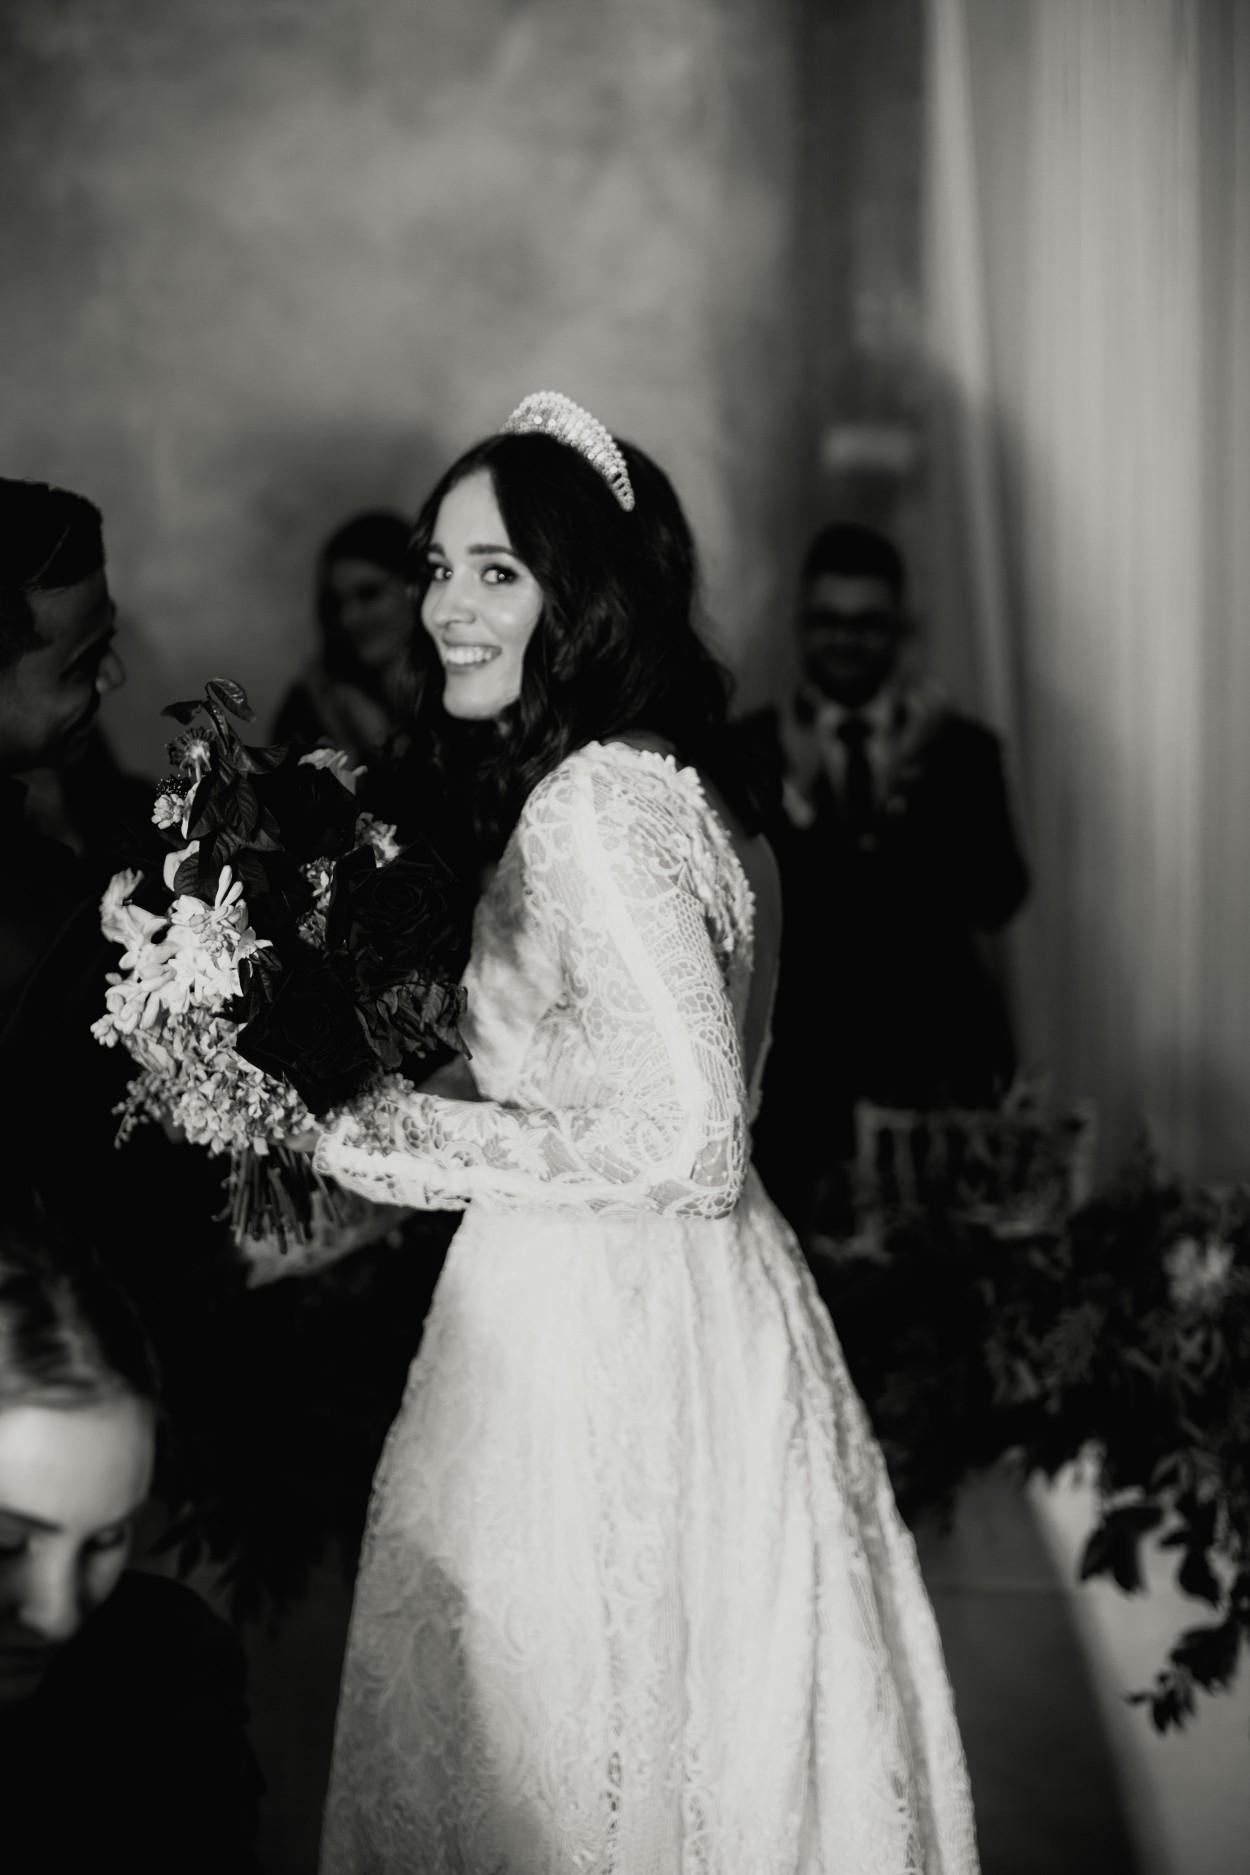 I-Got-You-Babe-Weddings-The-104George-Ballroom-St-Kilda-Wedding-Amy-Abhi.jpg